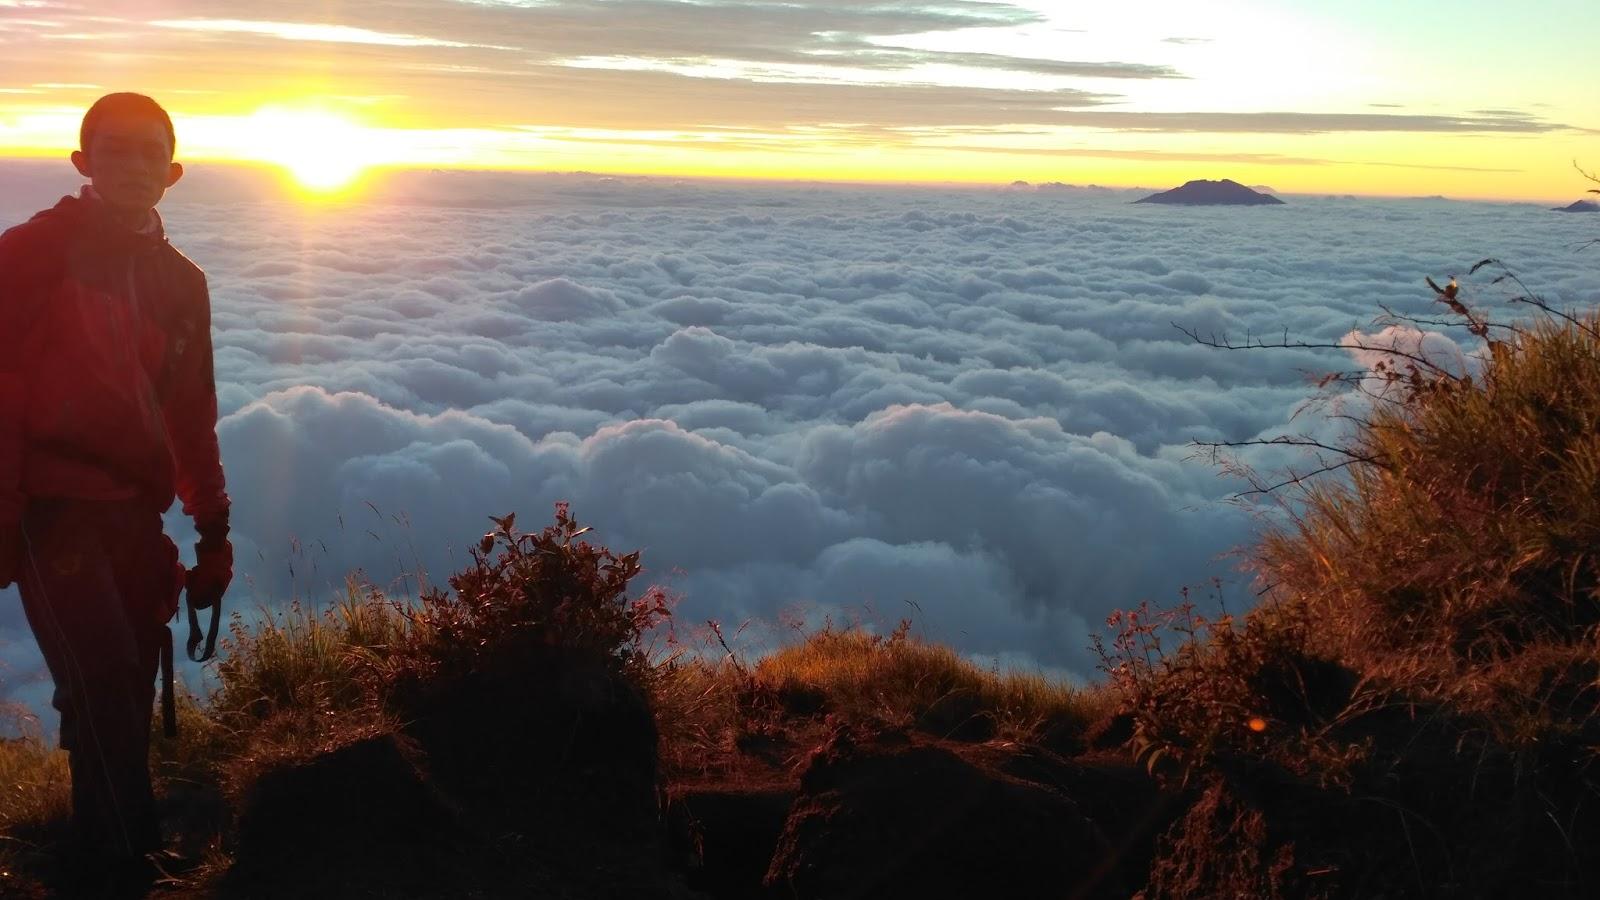 sunrise awan sumbing